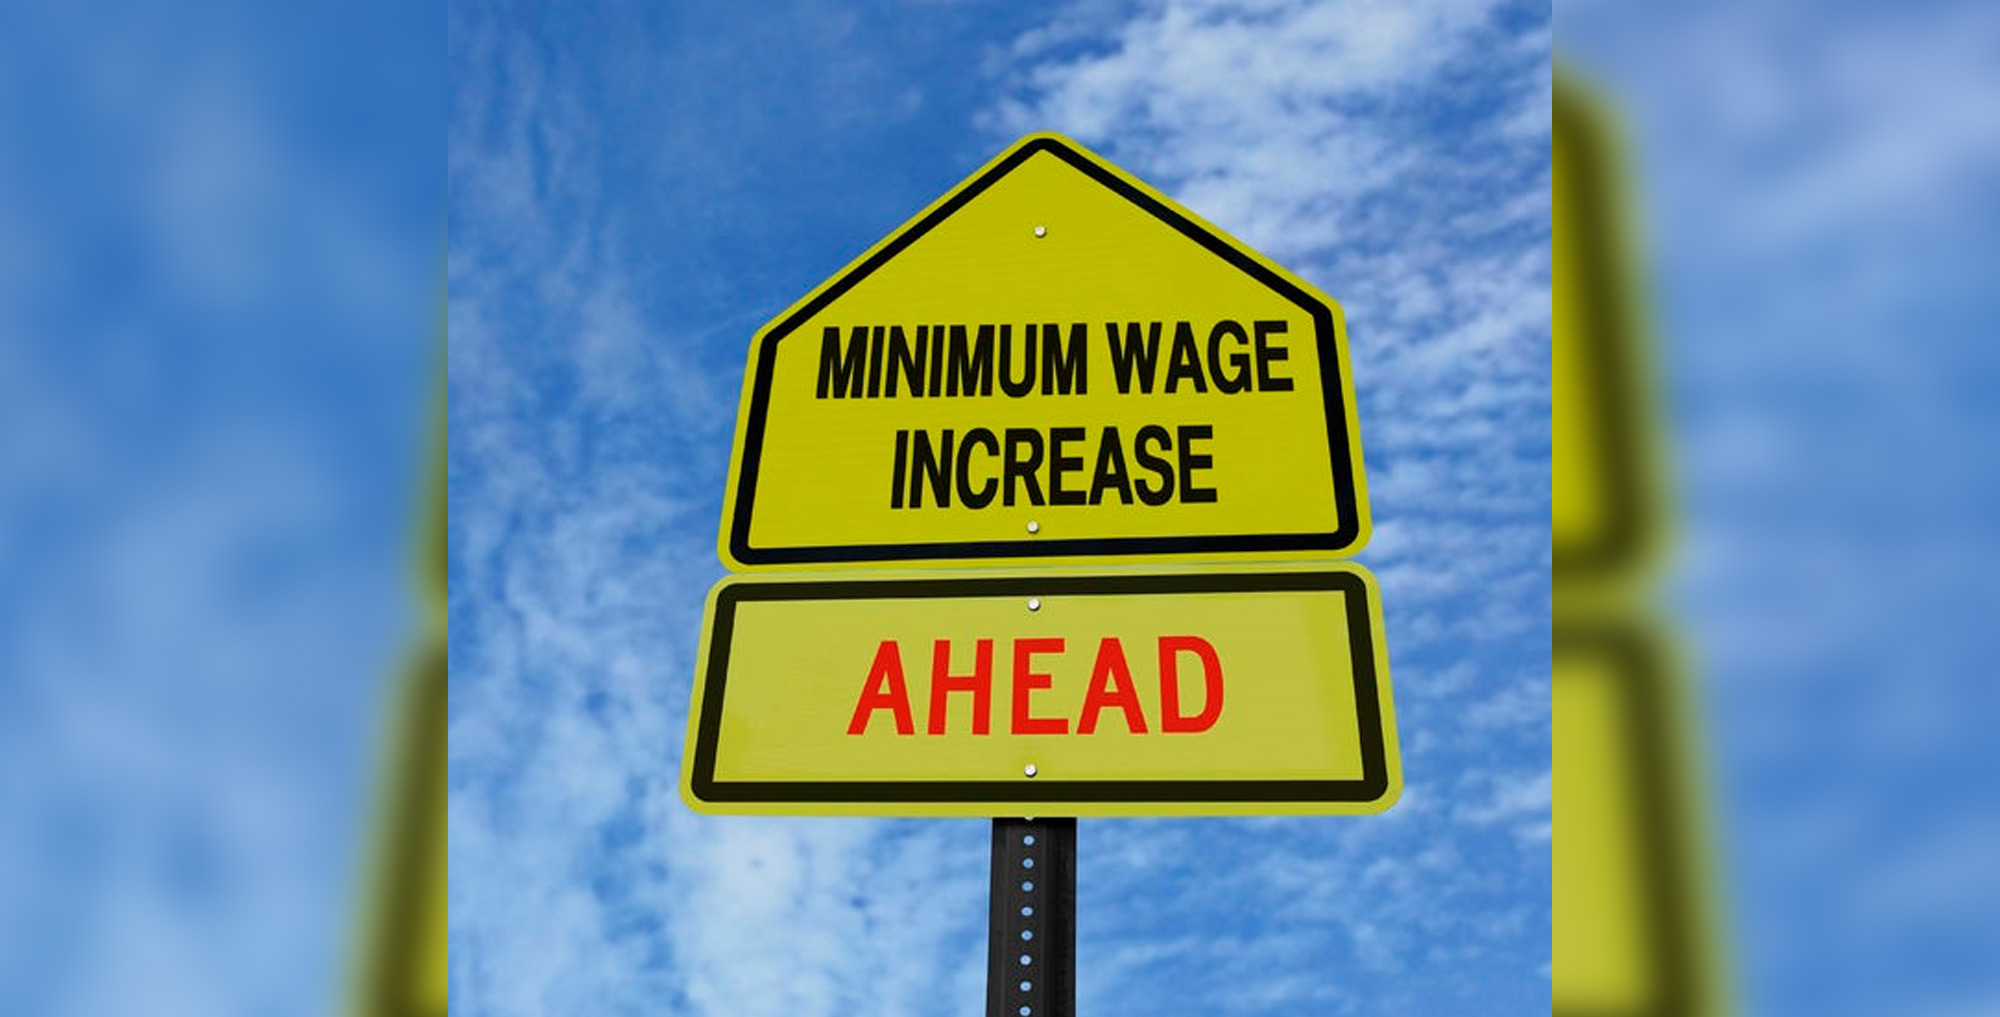 Road sign stating 'minimum wage increase ahead'